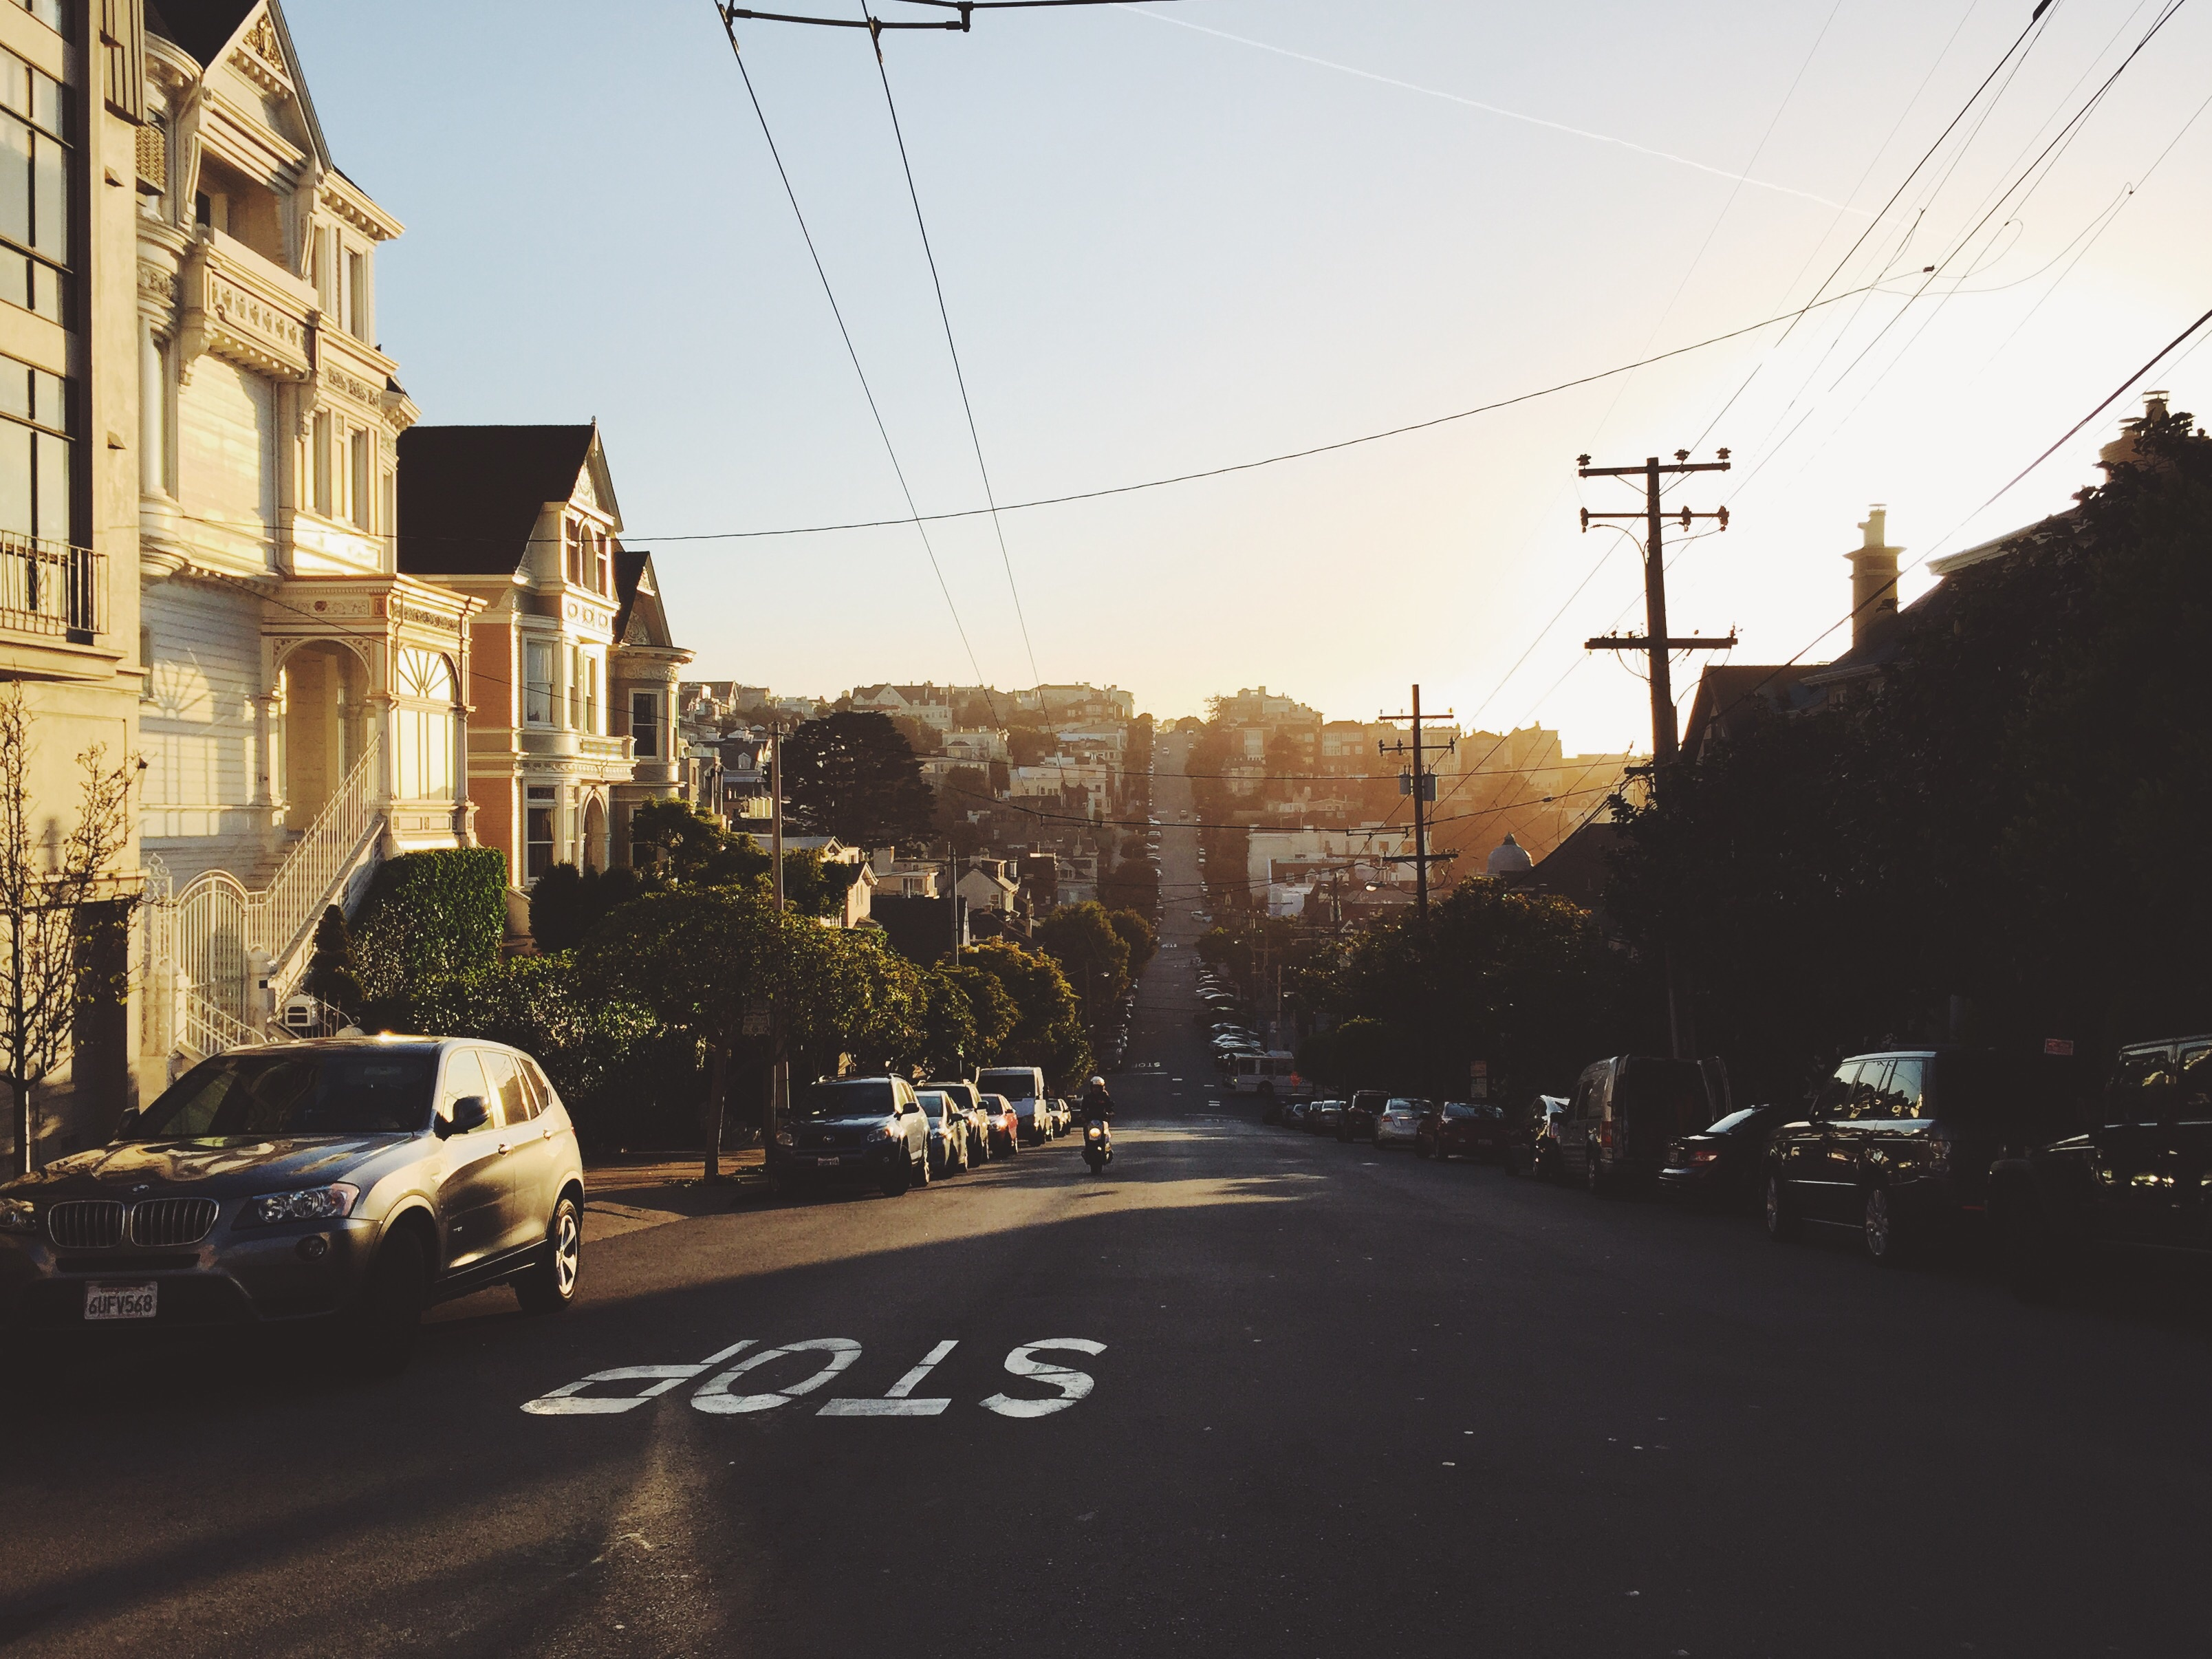 Street, Architecture, Biker, Building, Car, HQ Photo